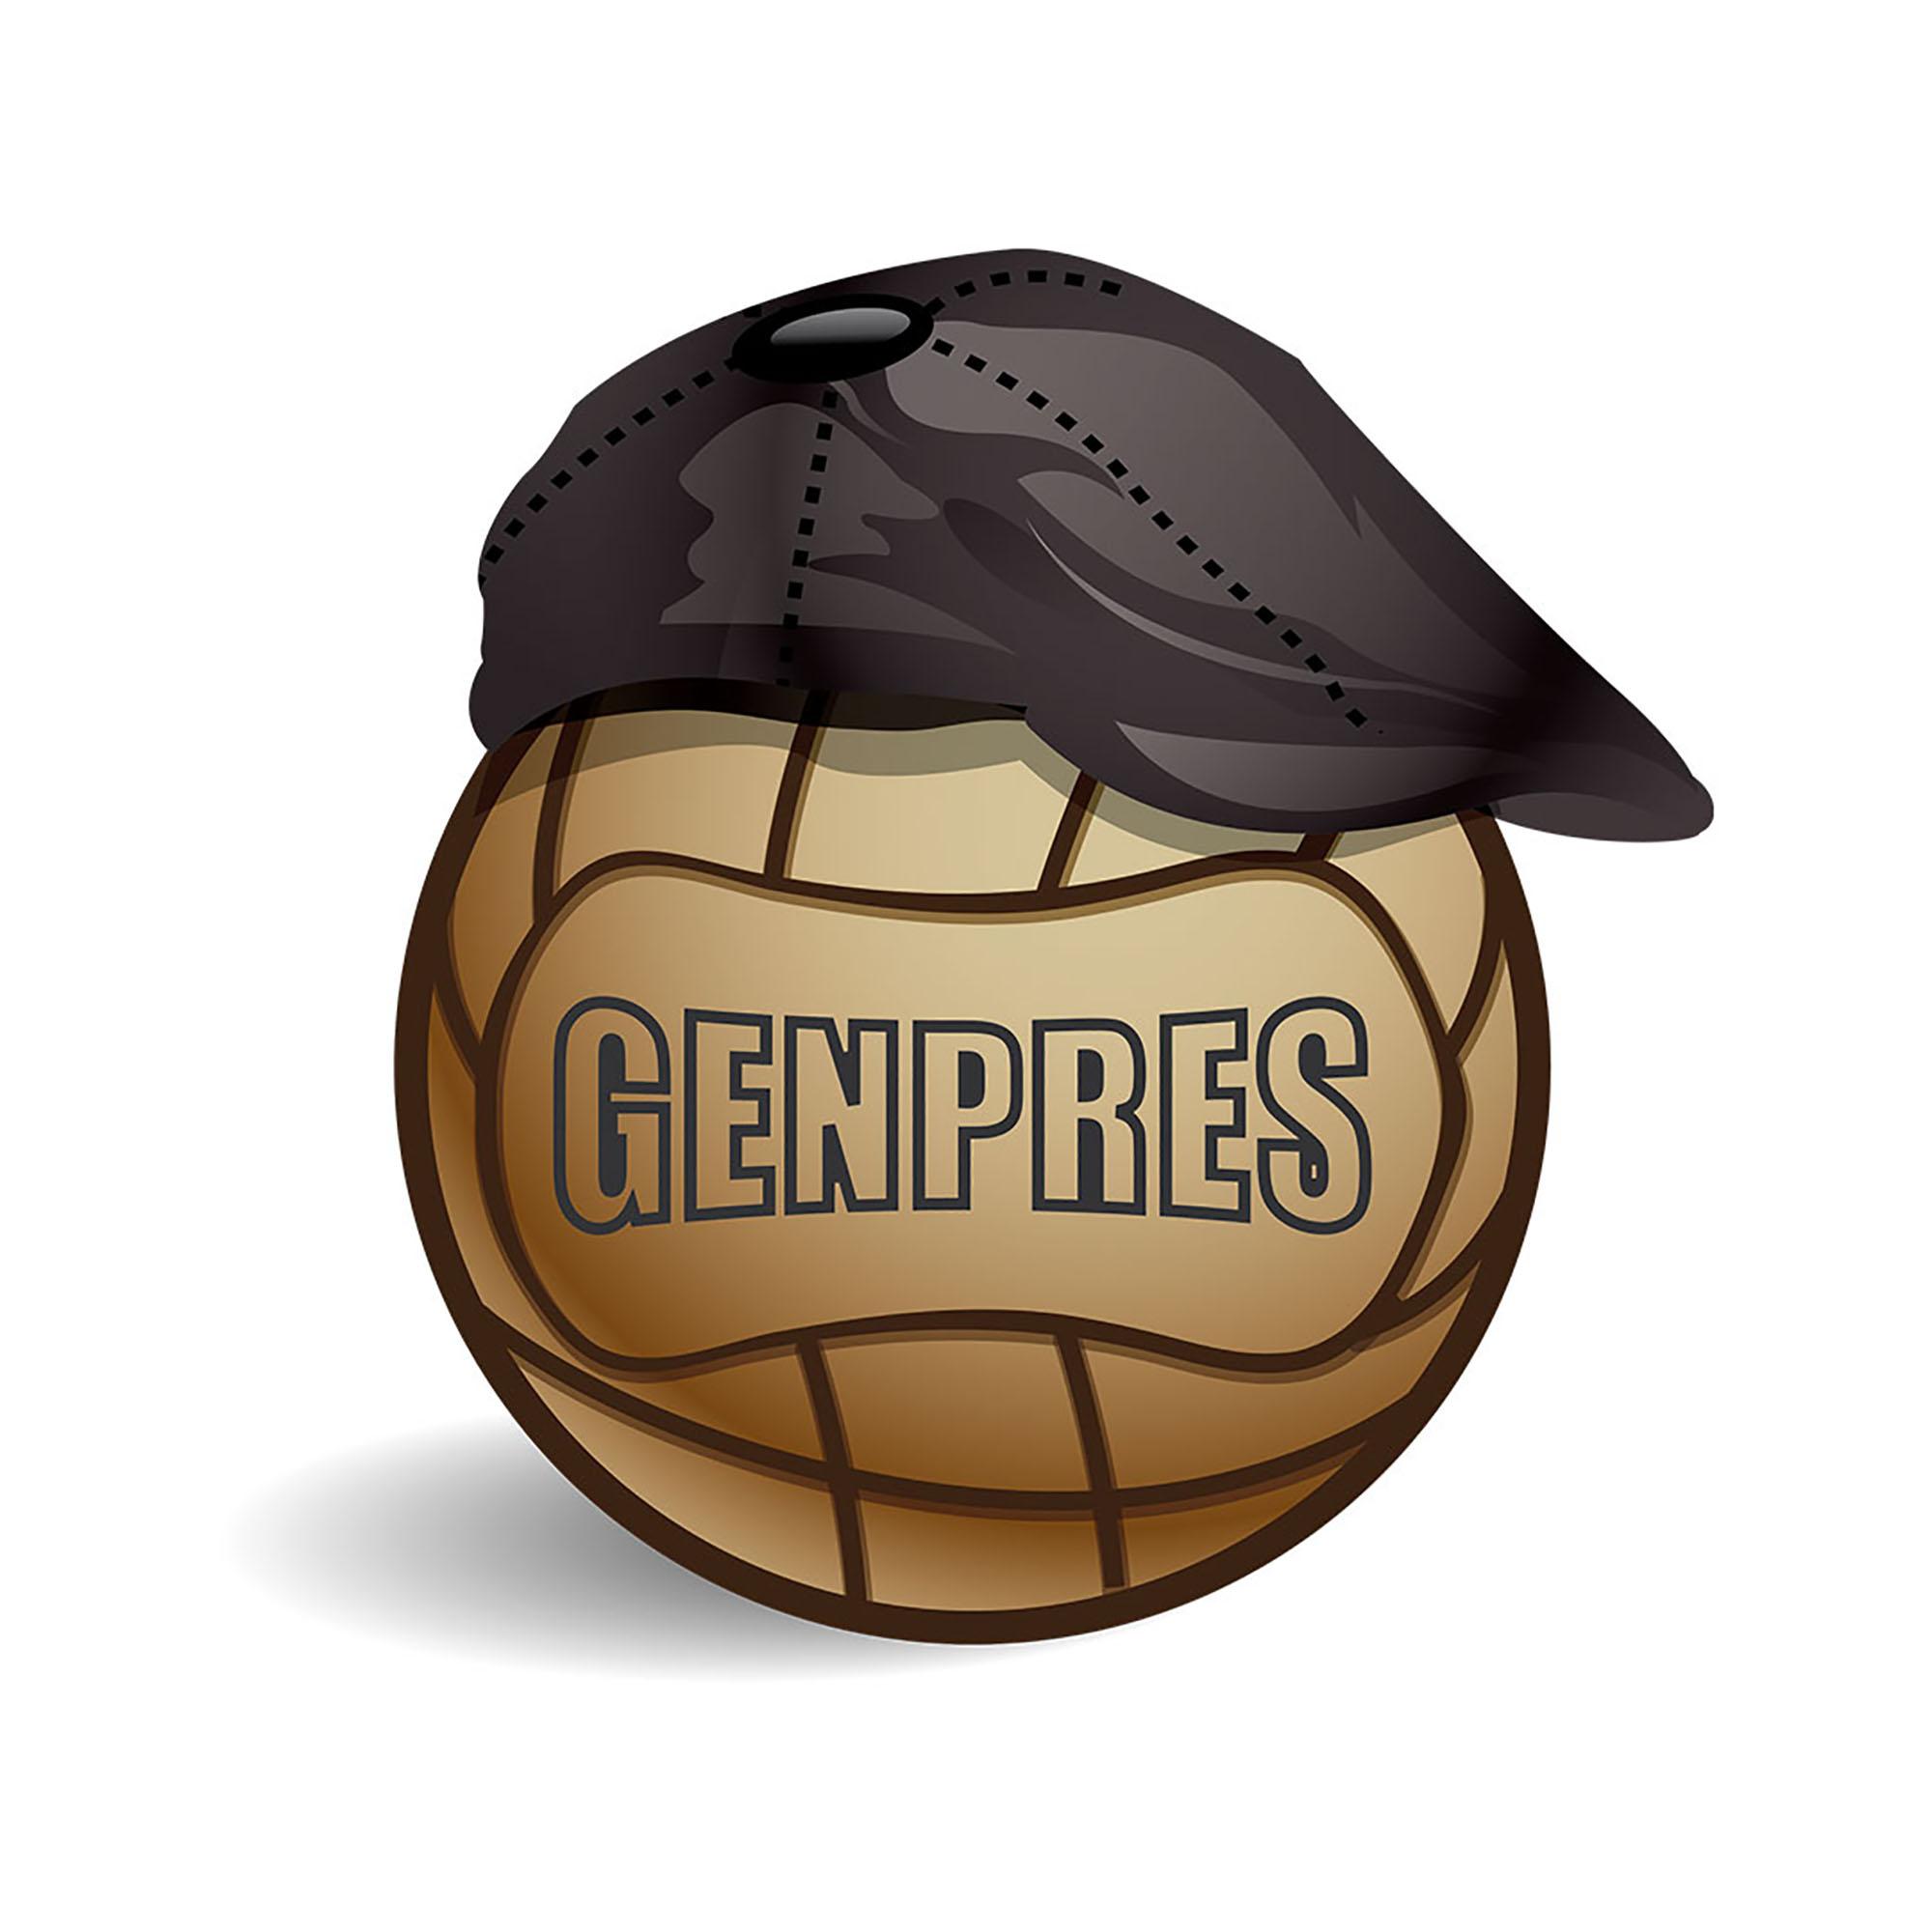 Genpres - Podcast om fodbold med Tom Carstensen show art